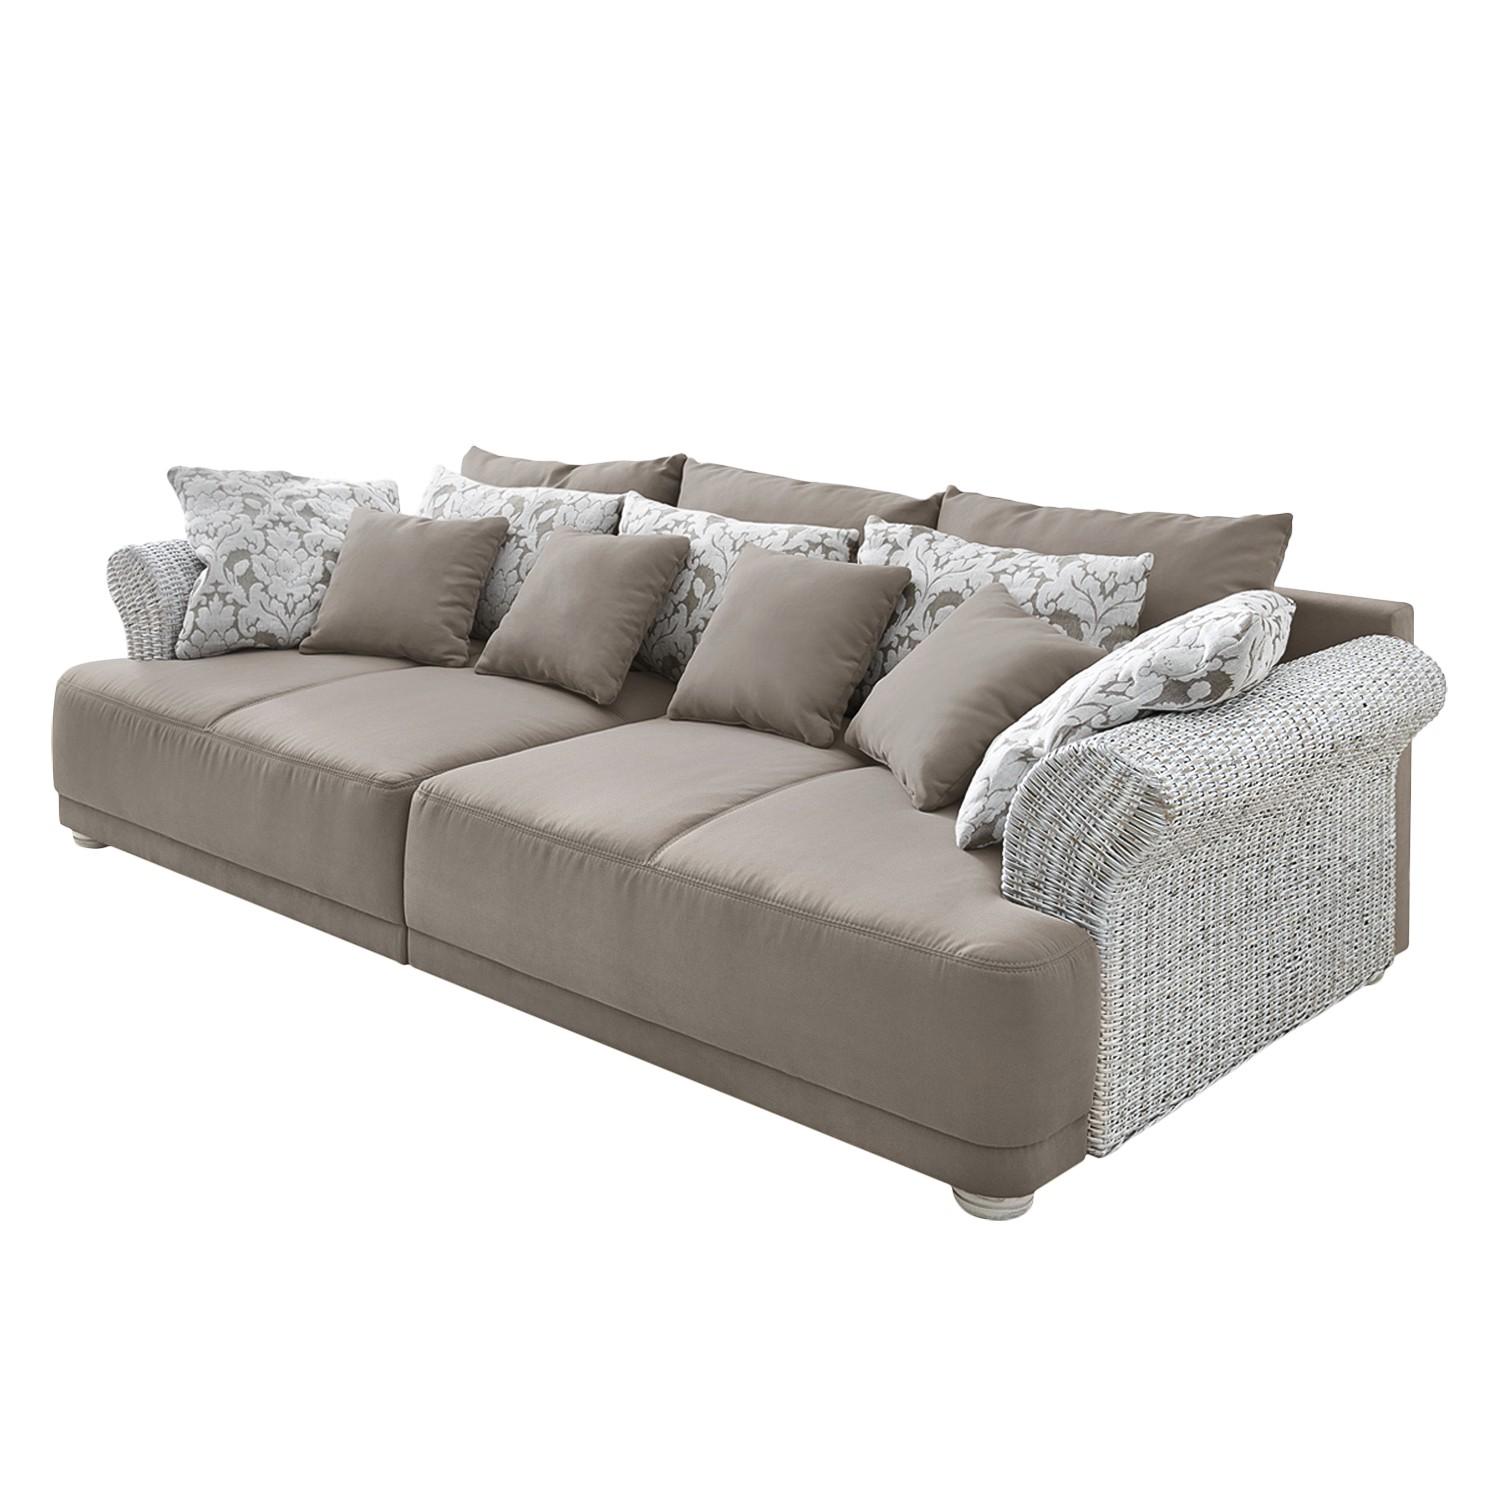 big sofa mehr als 1000 angebote fotos preise. Black Bedroom Furniture Sets. Home Design Ideas